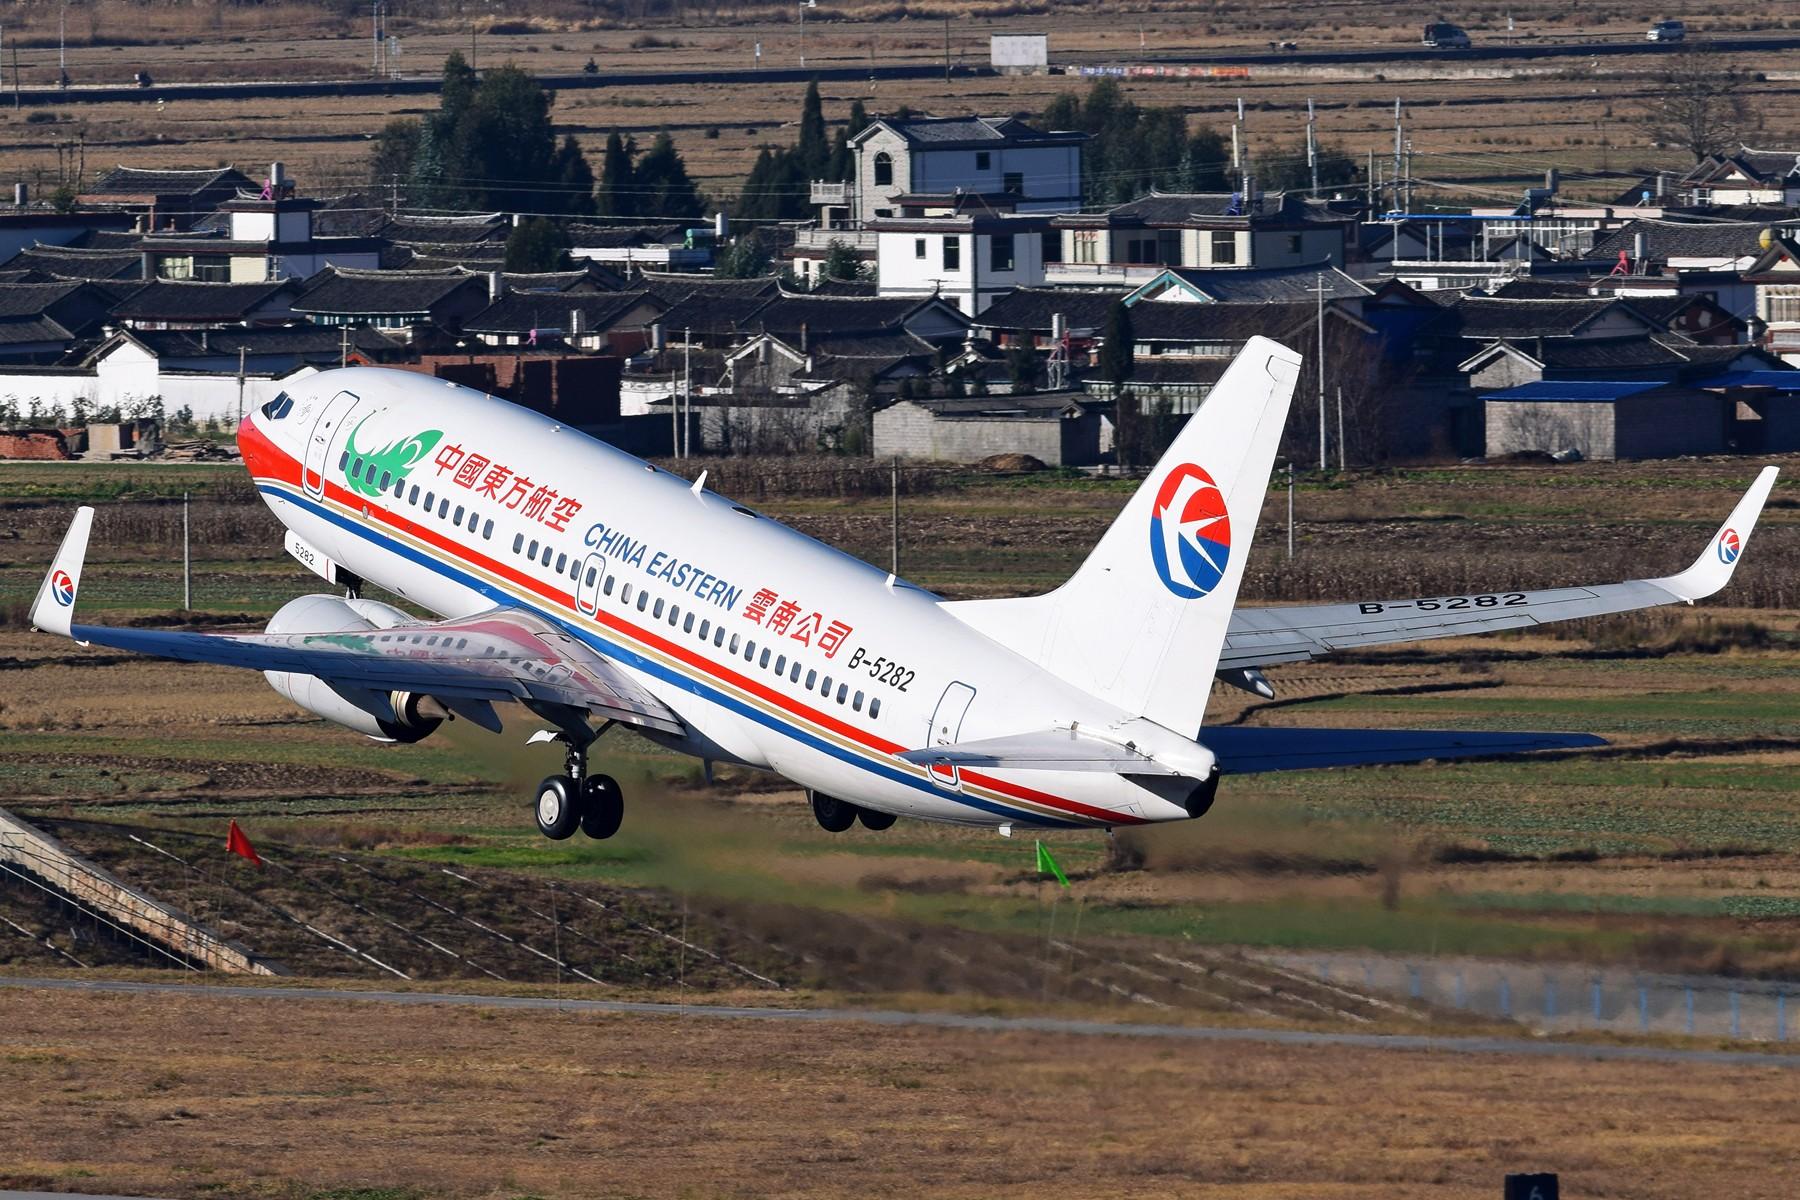 Re:[原创]补发的拍机游记---Day Trip for 丽江三义 BOEING 737-700 B-5282 中国丽江三义机场